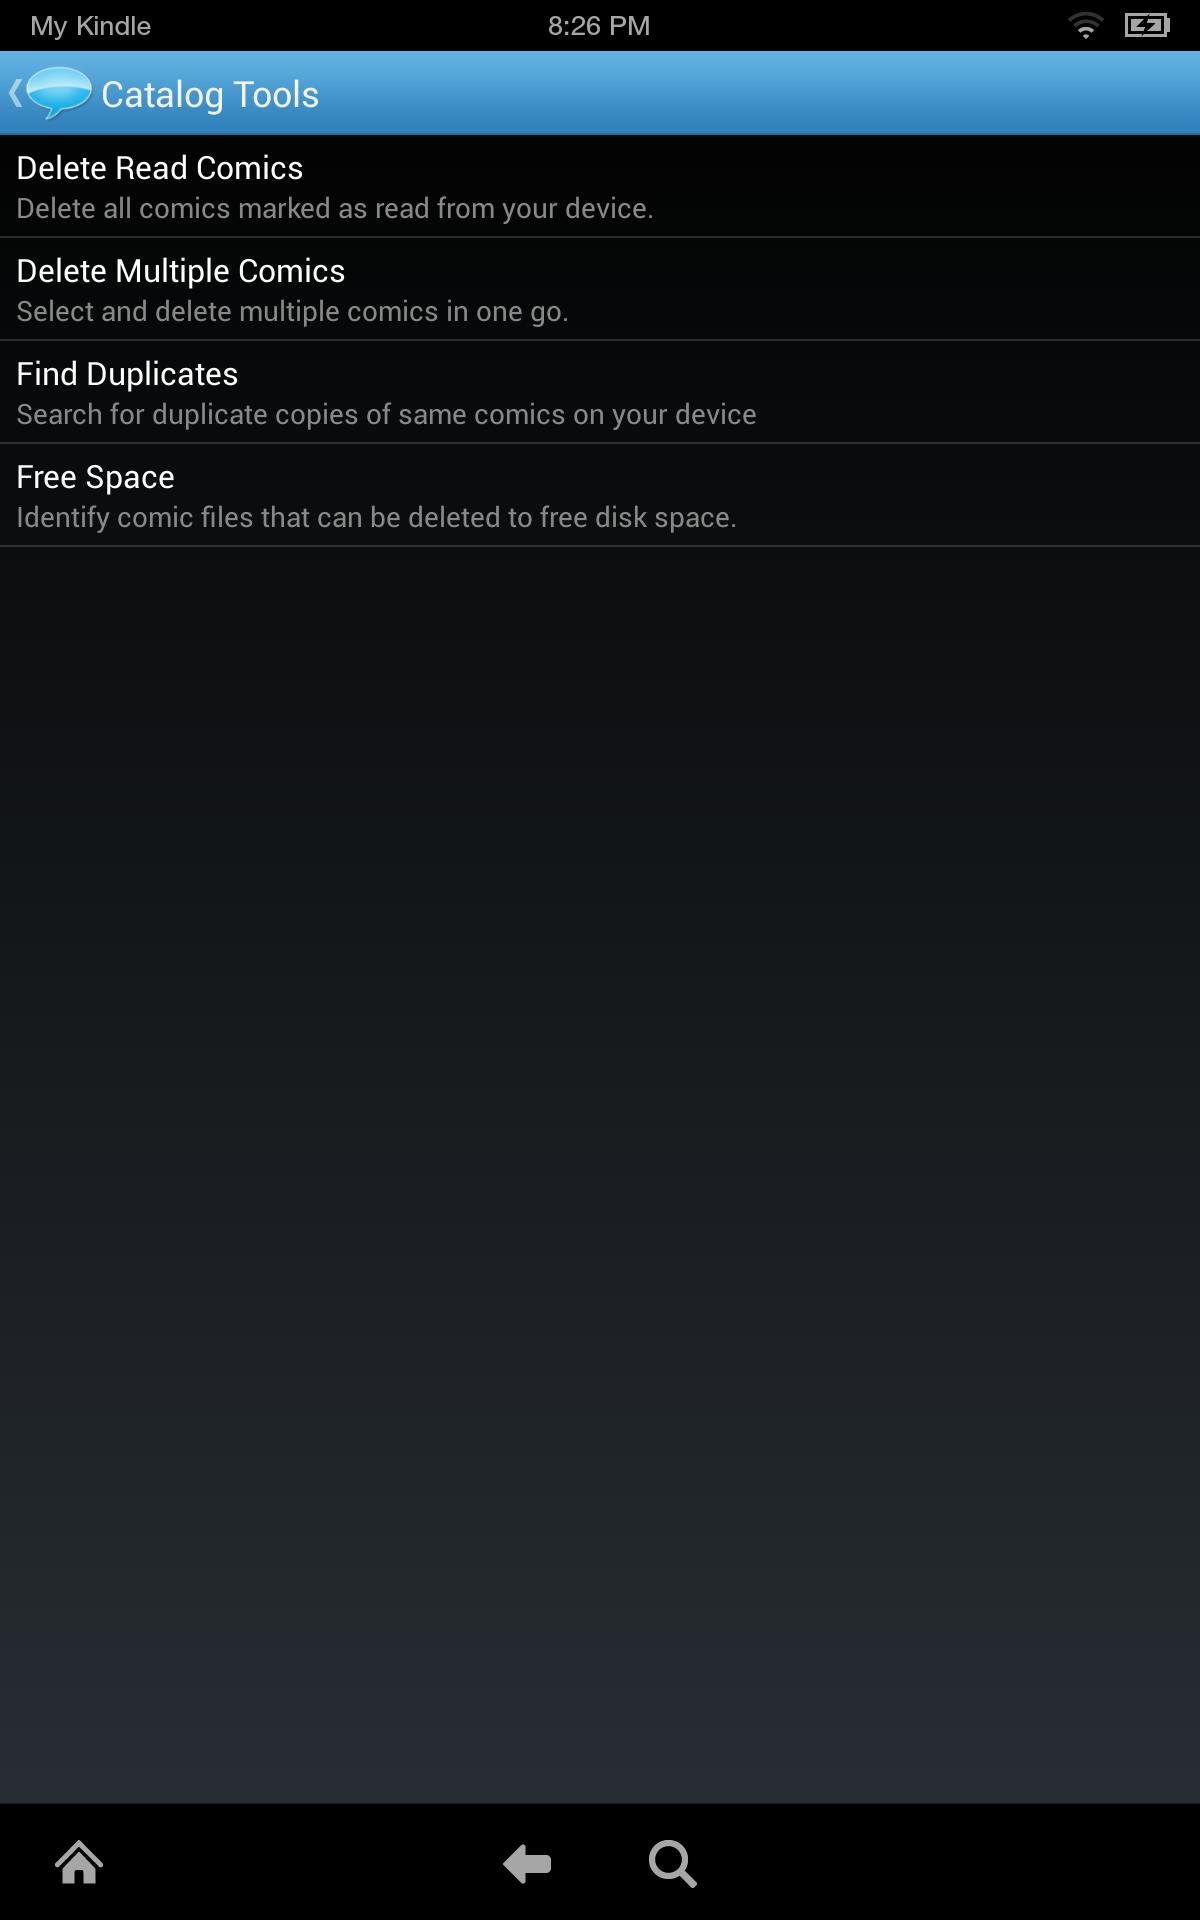 ComiCat (Comic Reader/Viewer): Amazon.co.uk: Appstore for ...